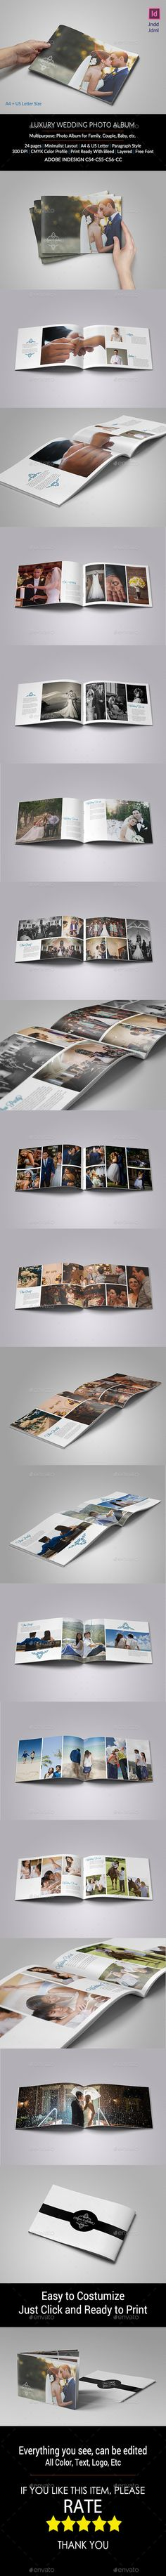 Simple Wedding Photo Album | Wedding photo albums, Simple weddings ...